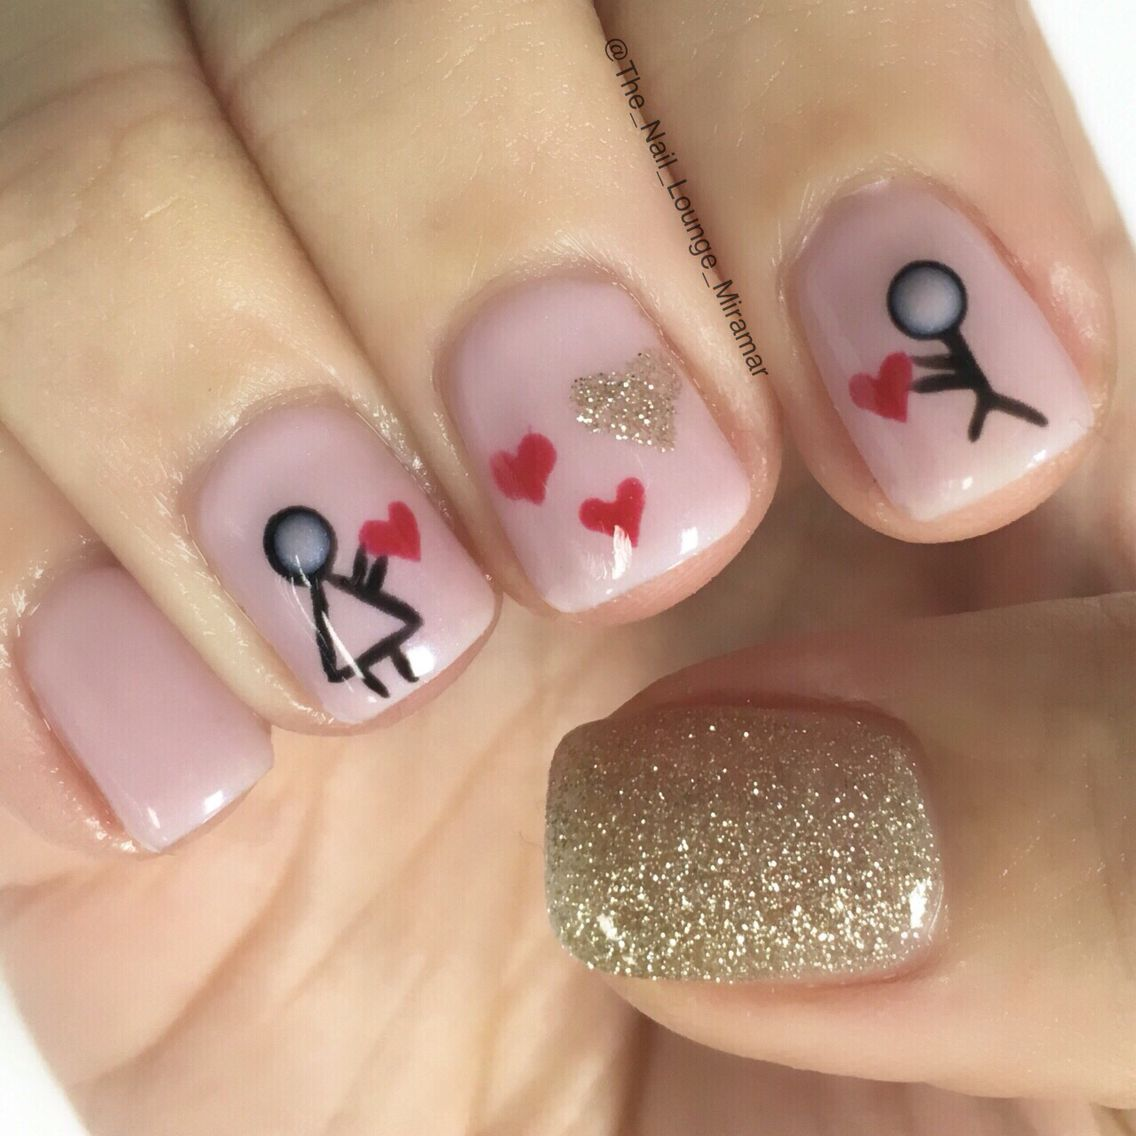 Valentines Stick Figure Love Nail Art Design Valentines Nails Nail Art Hacks Nail Art Designs